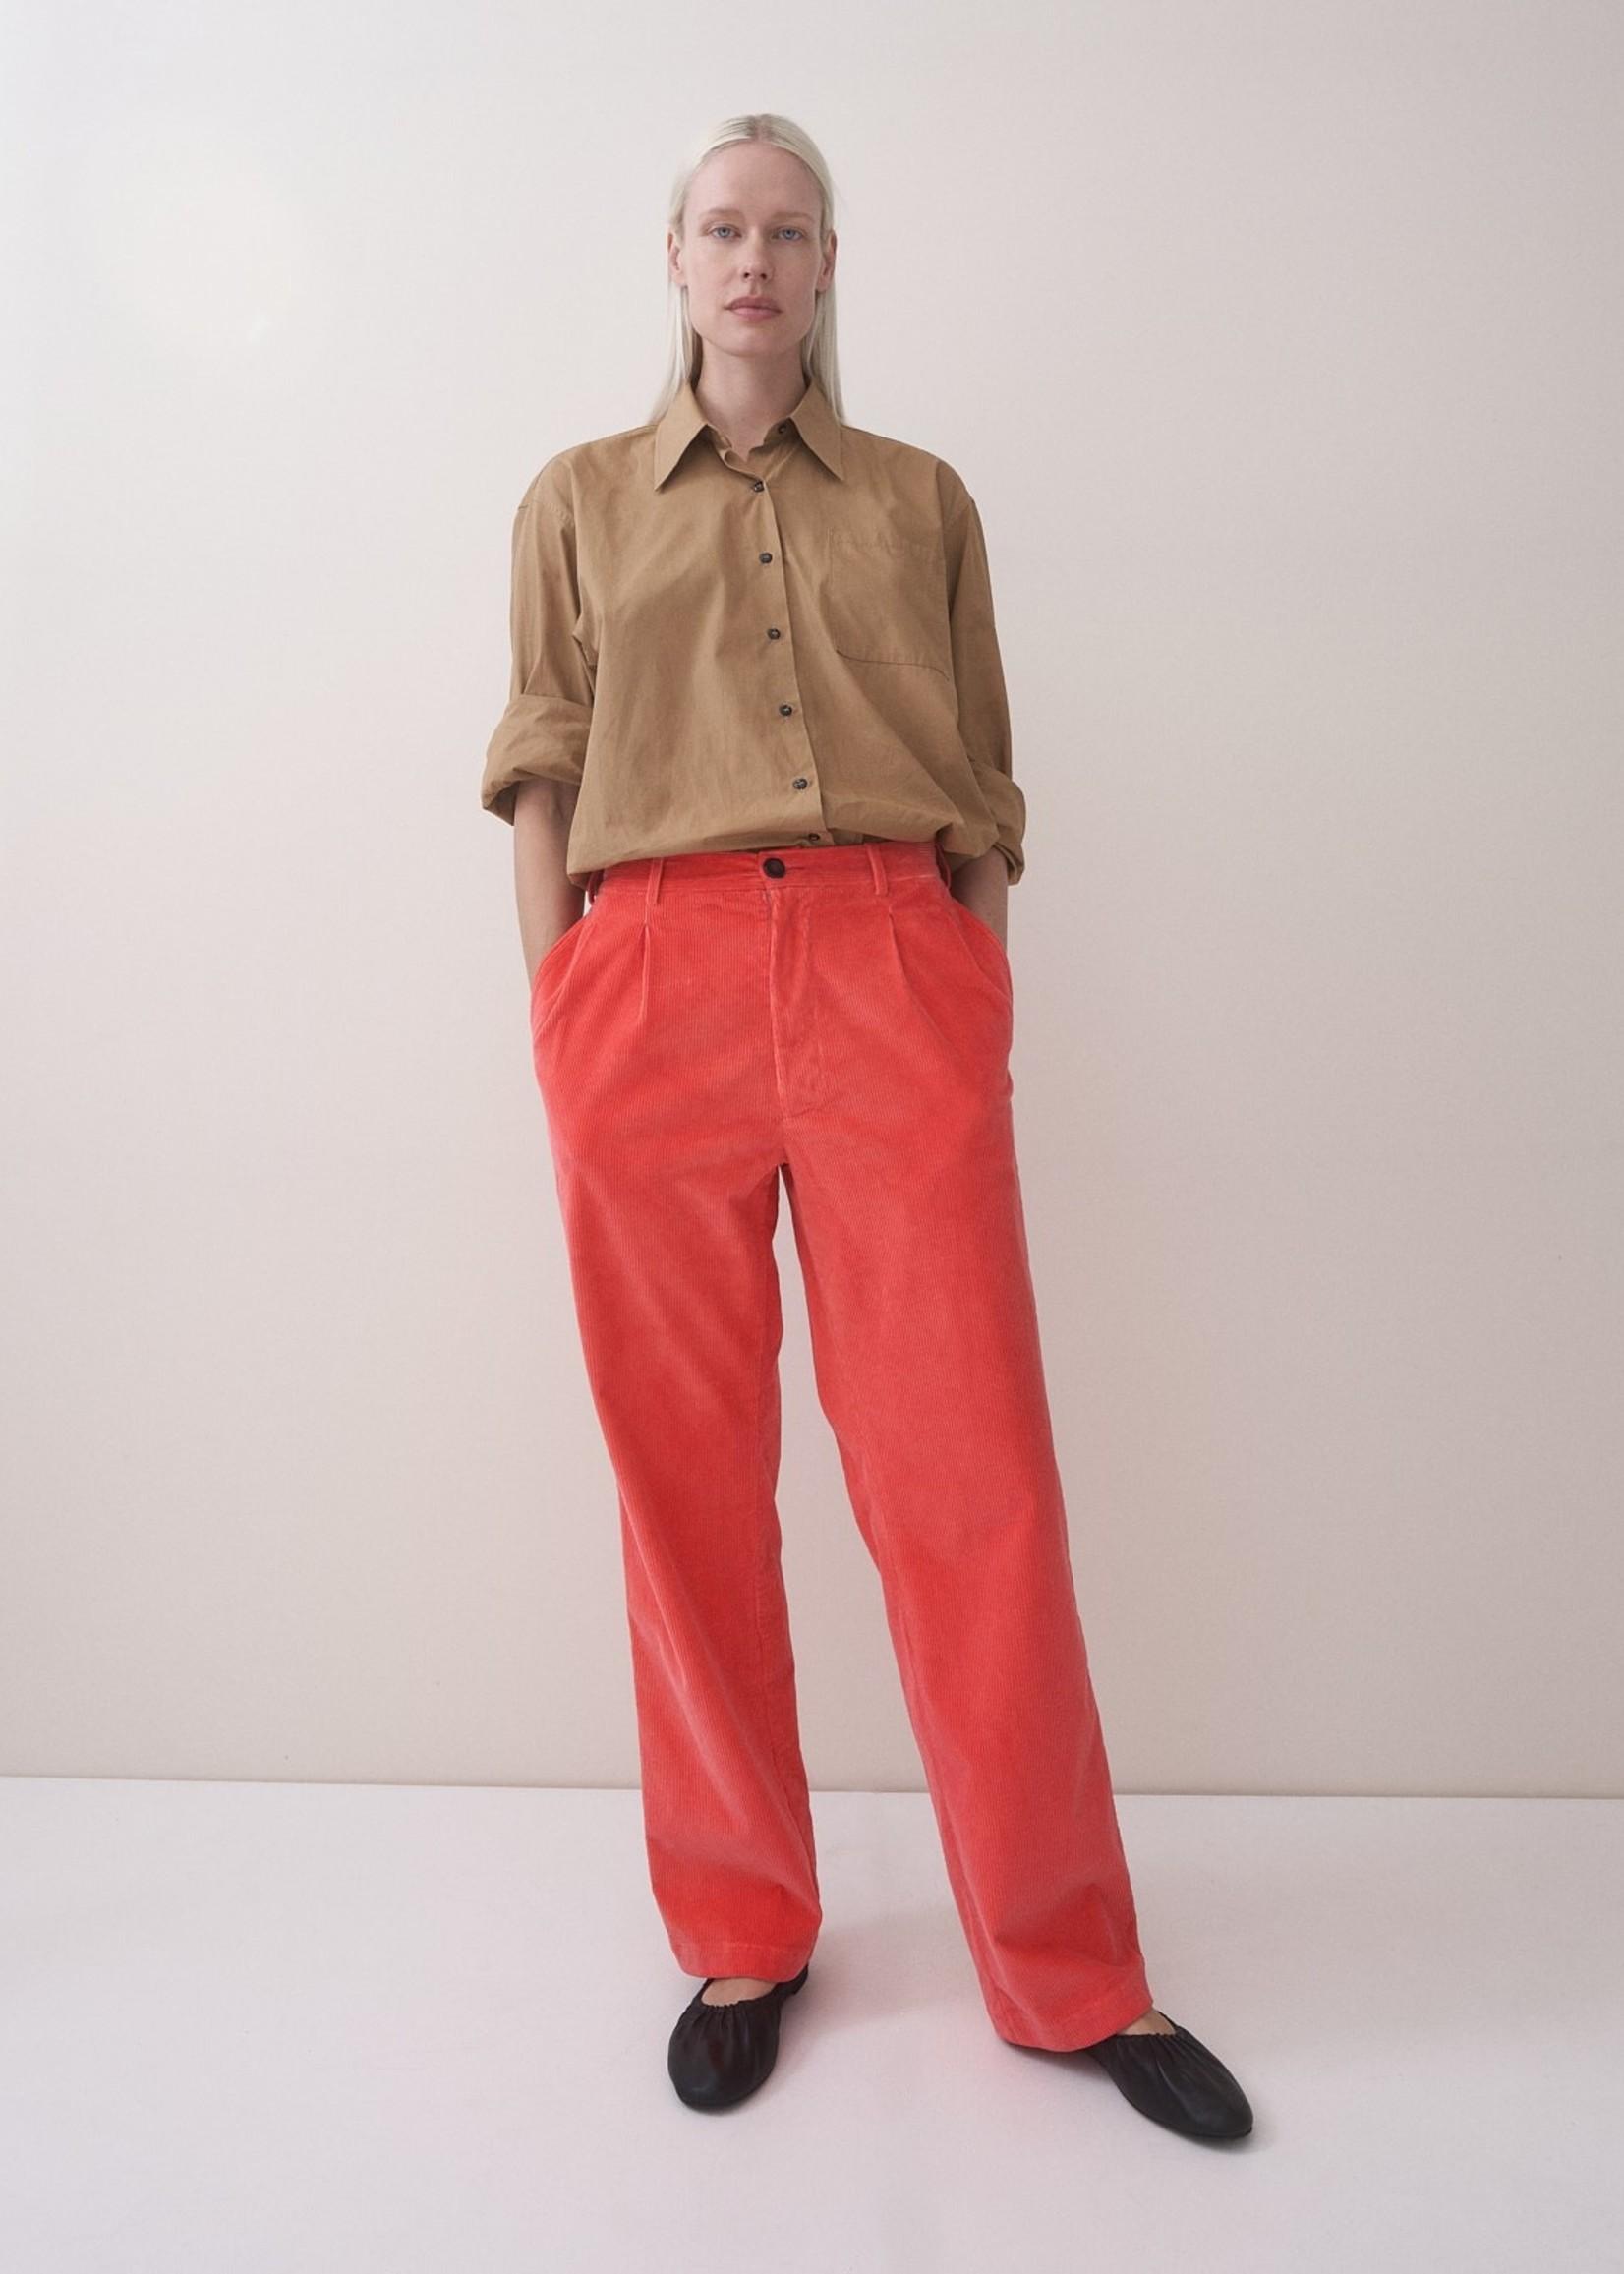 rikastudios rika studios polo pants cotton, hibiscus